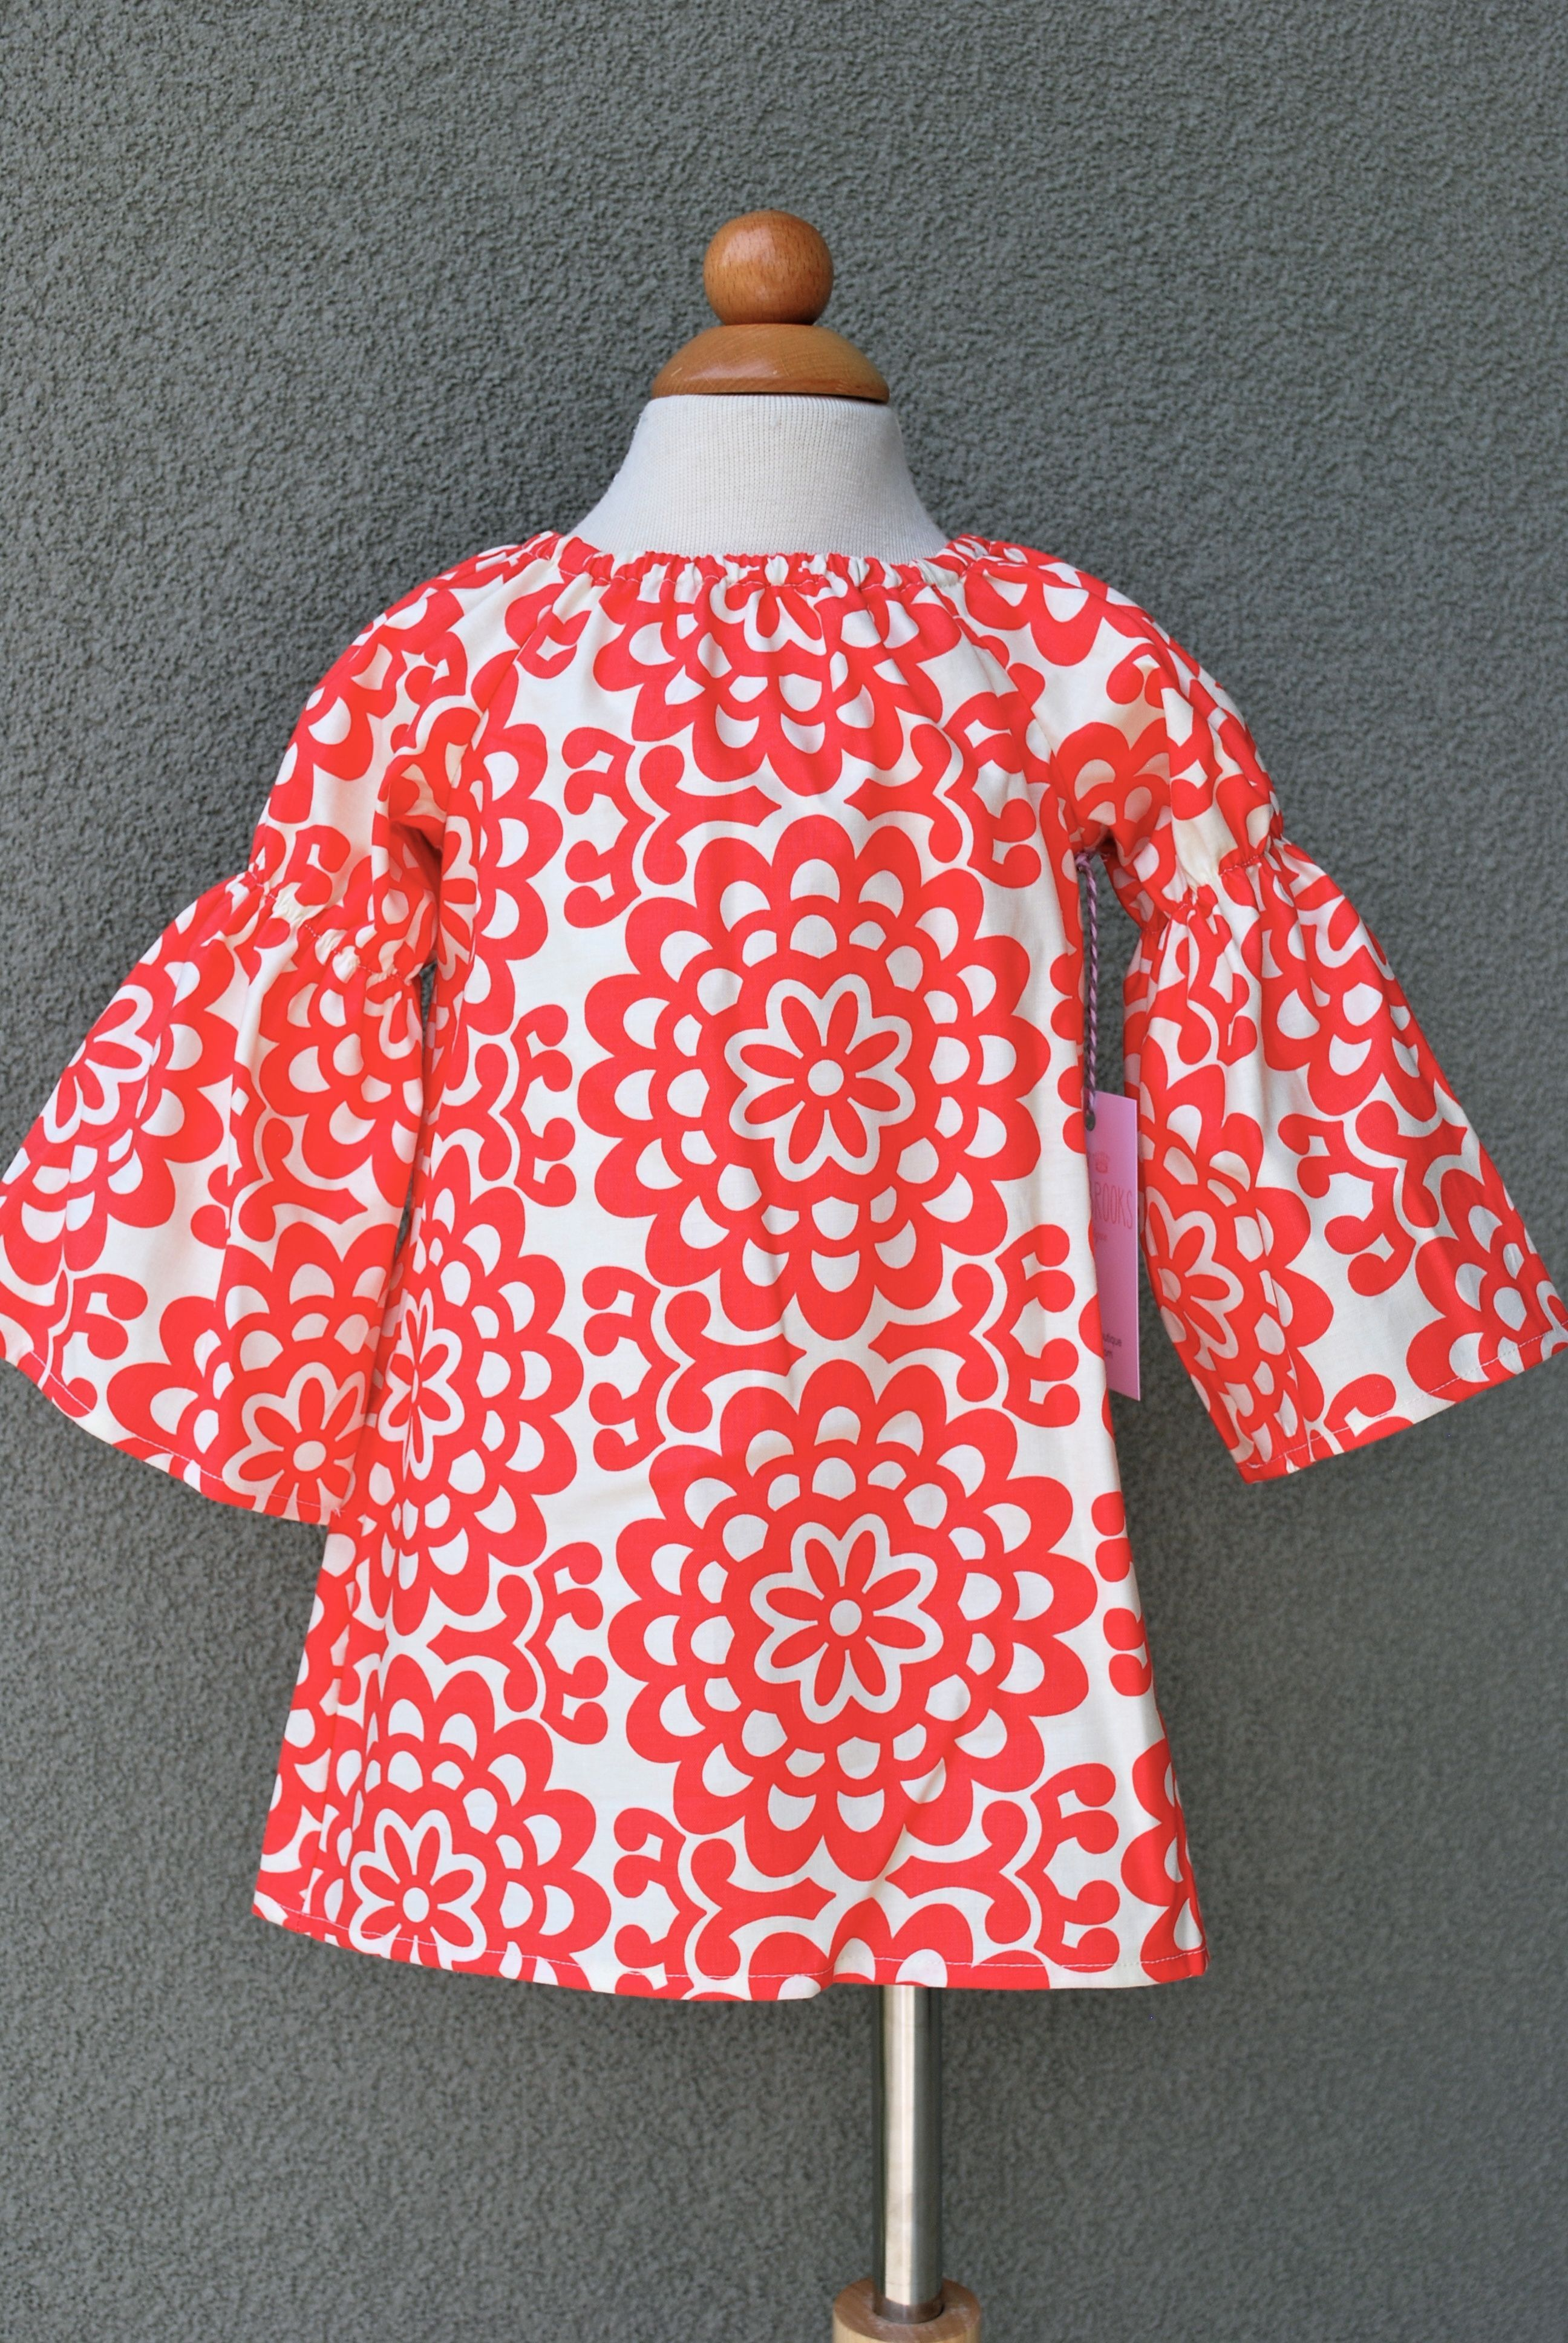 Amy Butler Lotus cherry/ivory dress $38 www.facebook.com/ellabrooksboutique